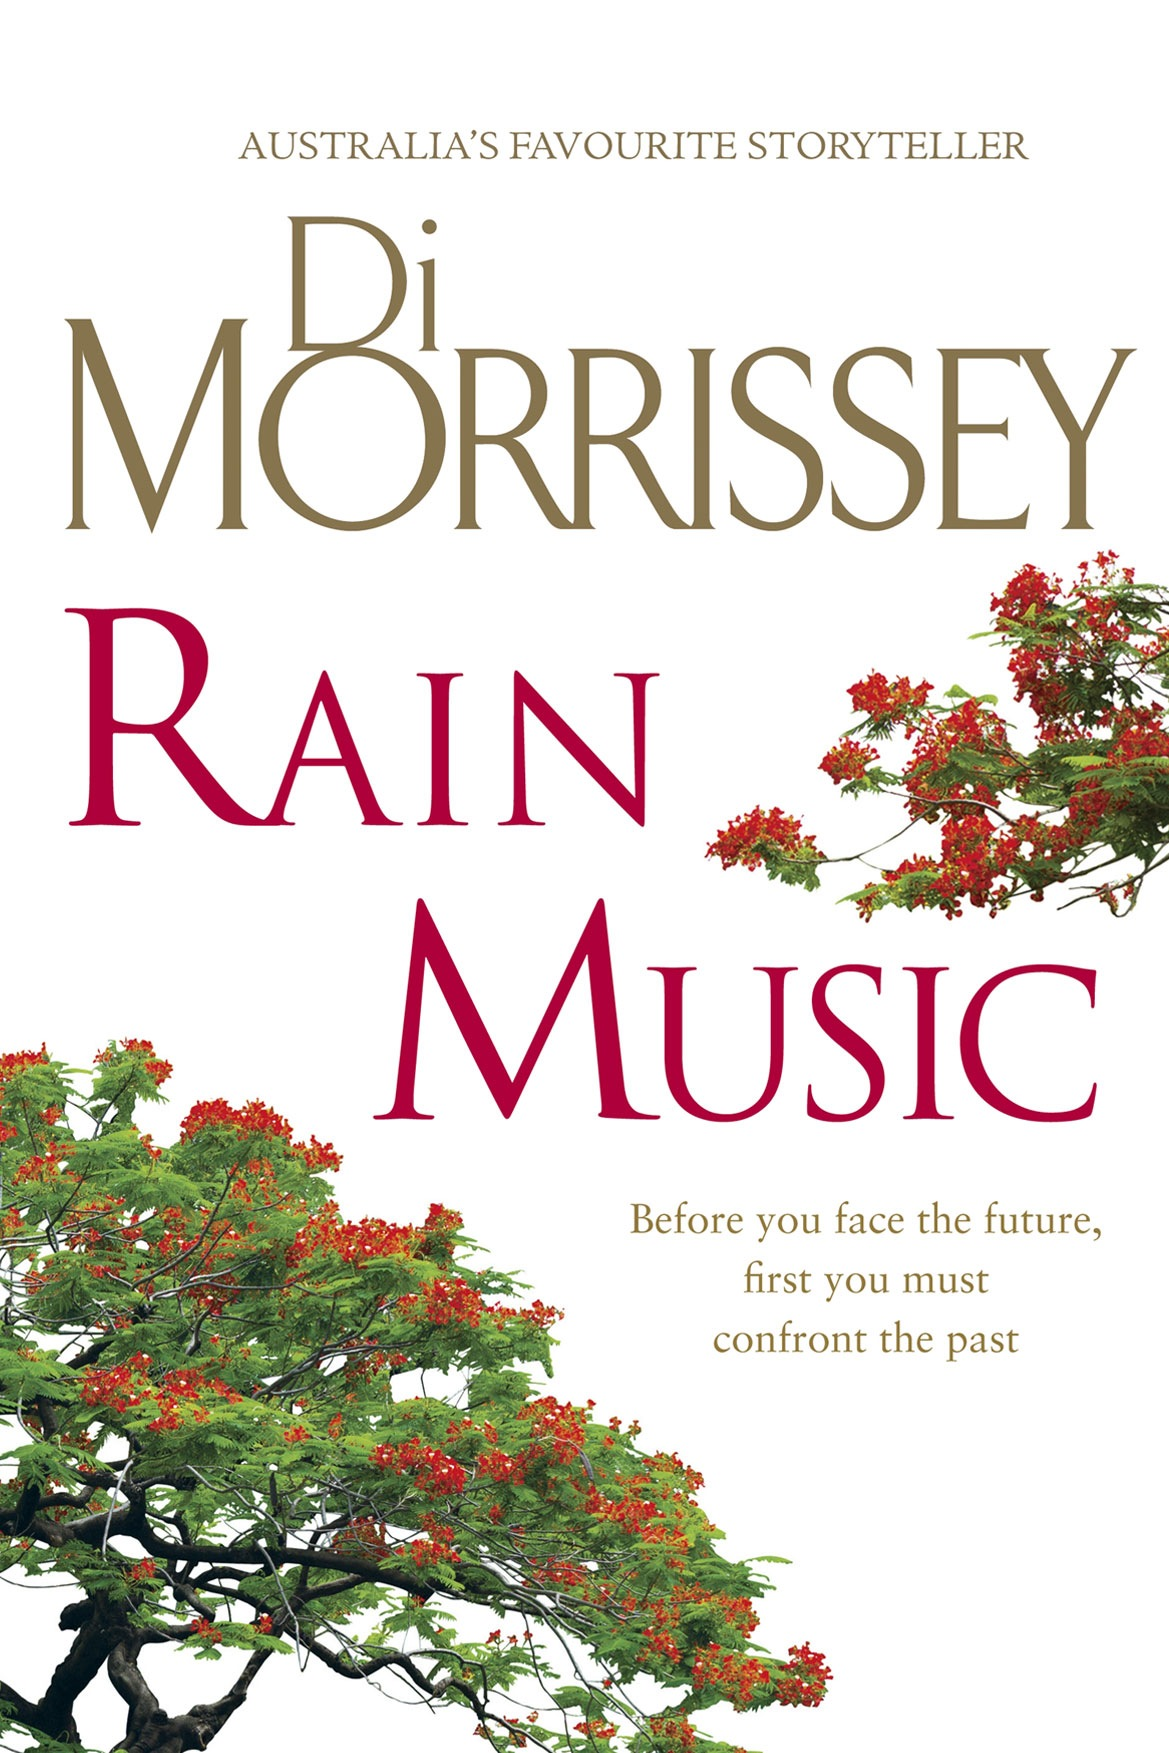 Rain music by di morrissey hardback myer online rain music by di morrissey hardback myer online fandeluxe PDF